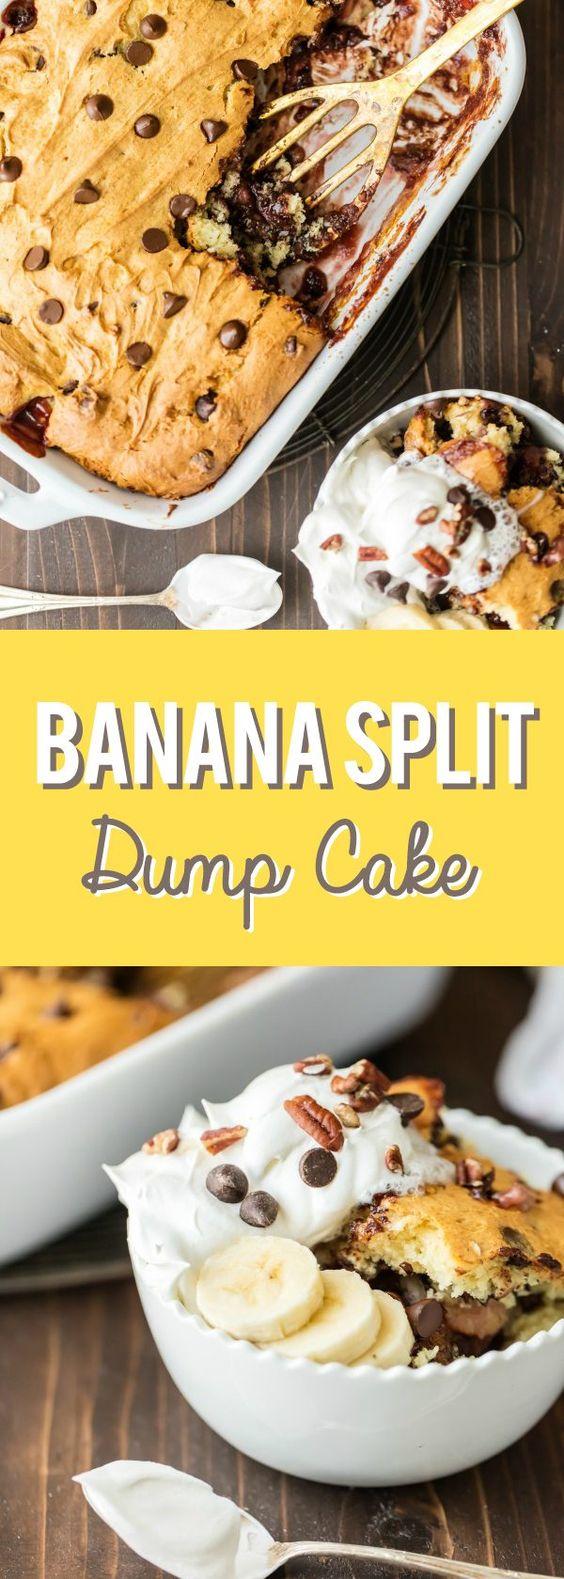 Banana Split Dump Cake